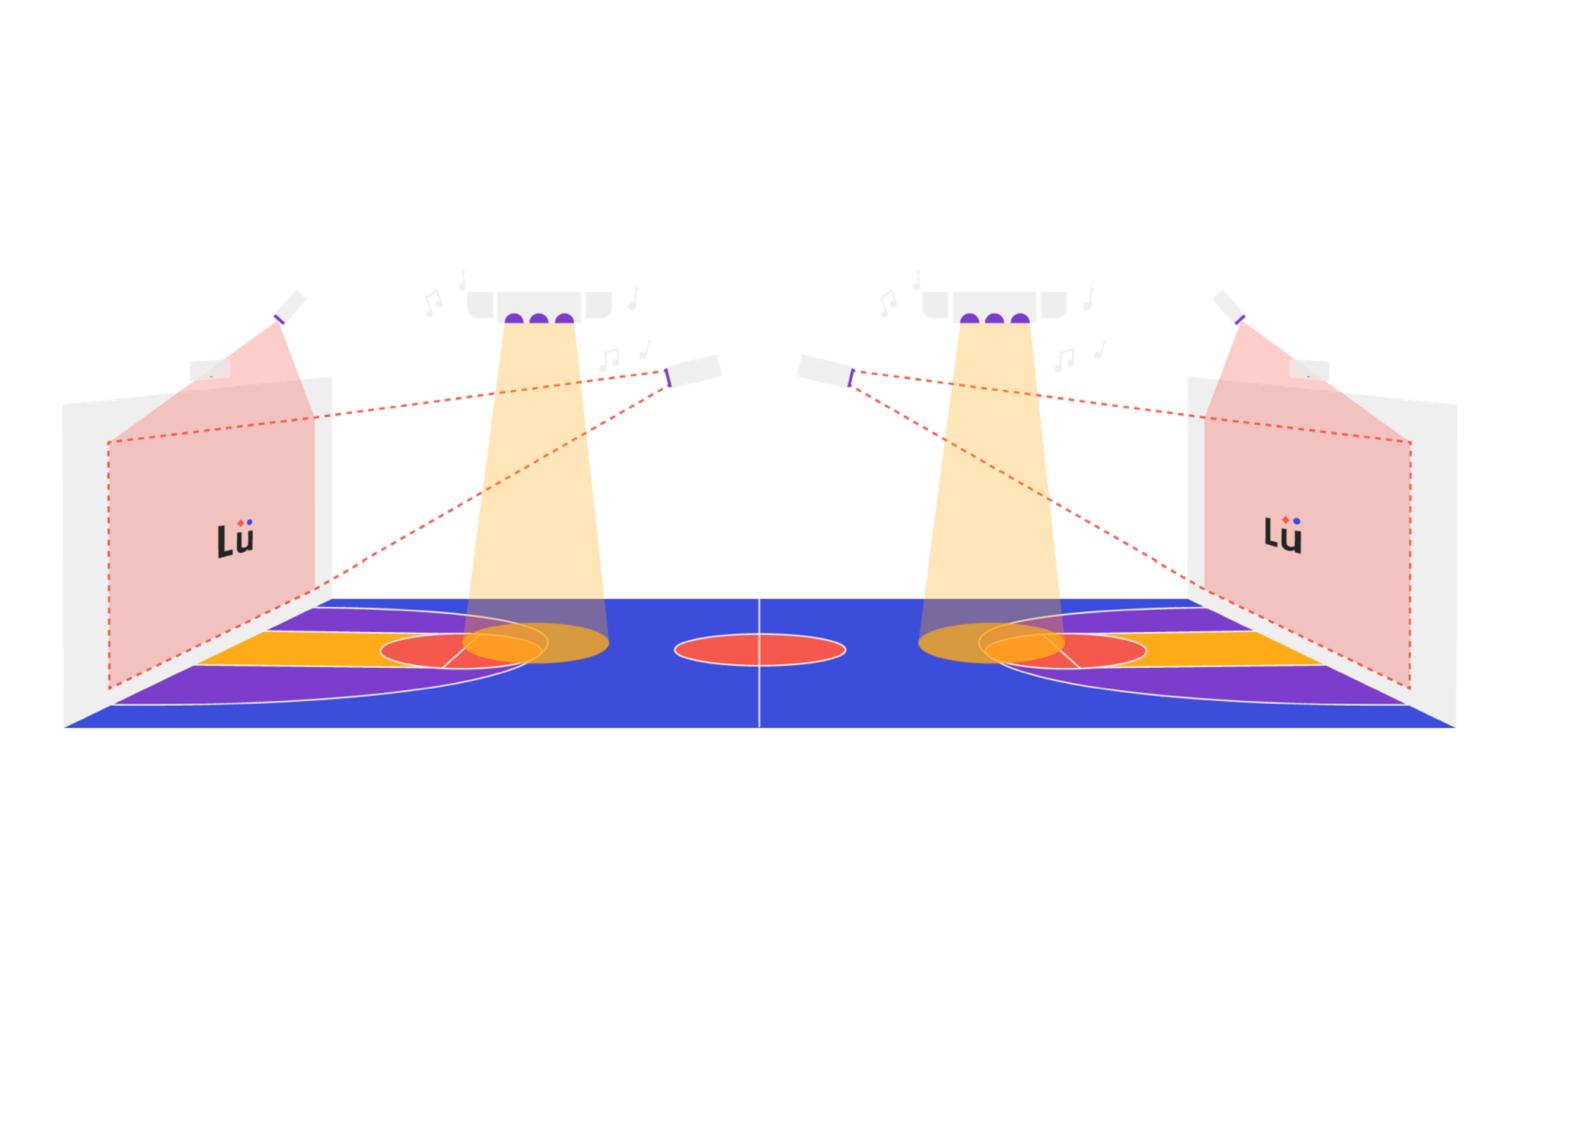 système interactif Lü configuration DUO